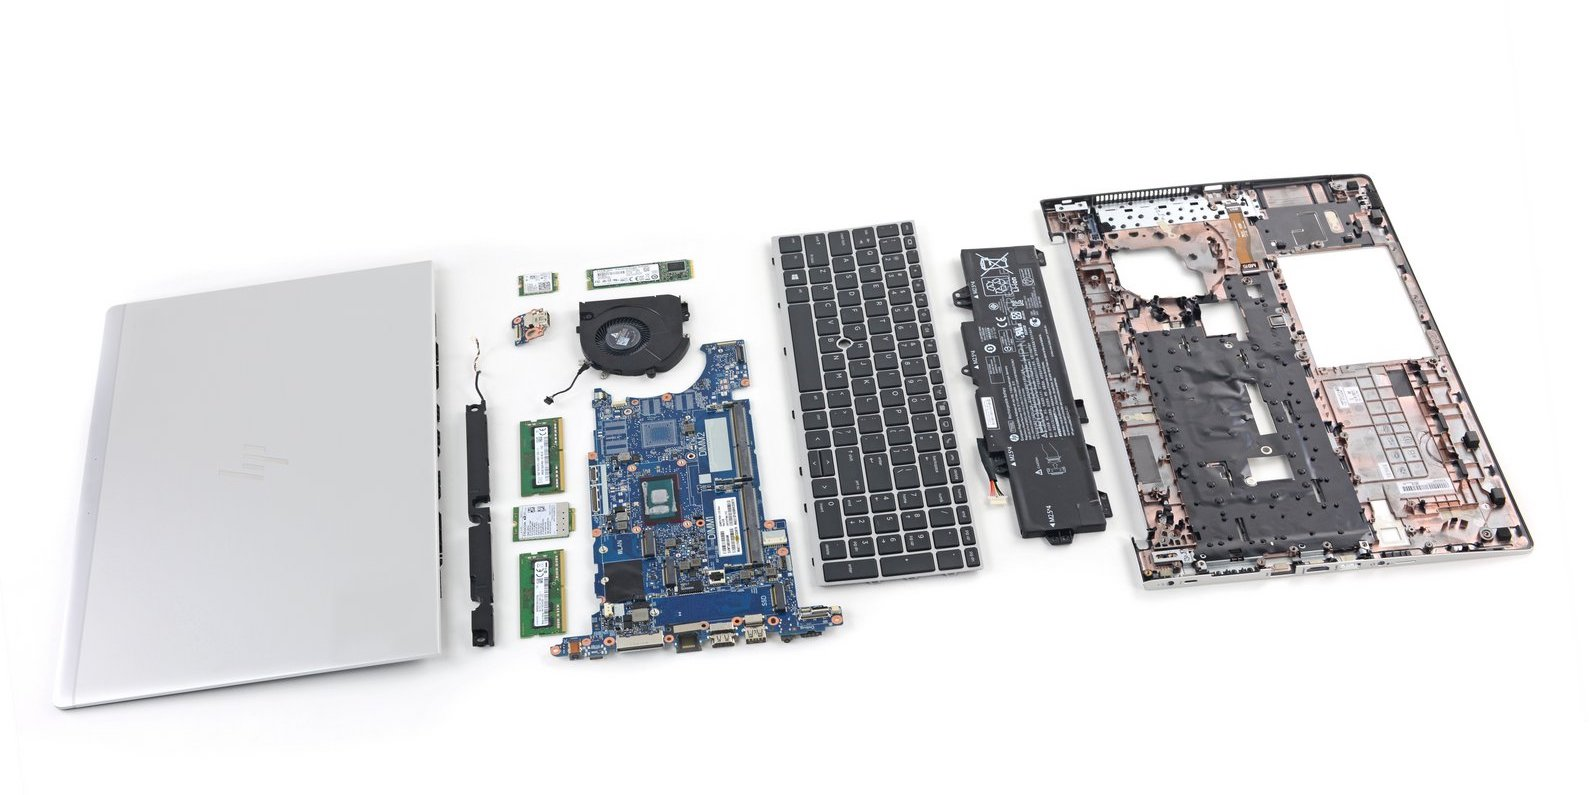 HP EliteBook disassembled